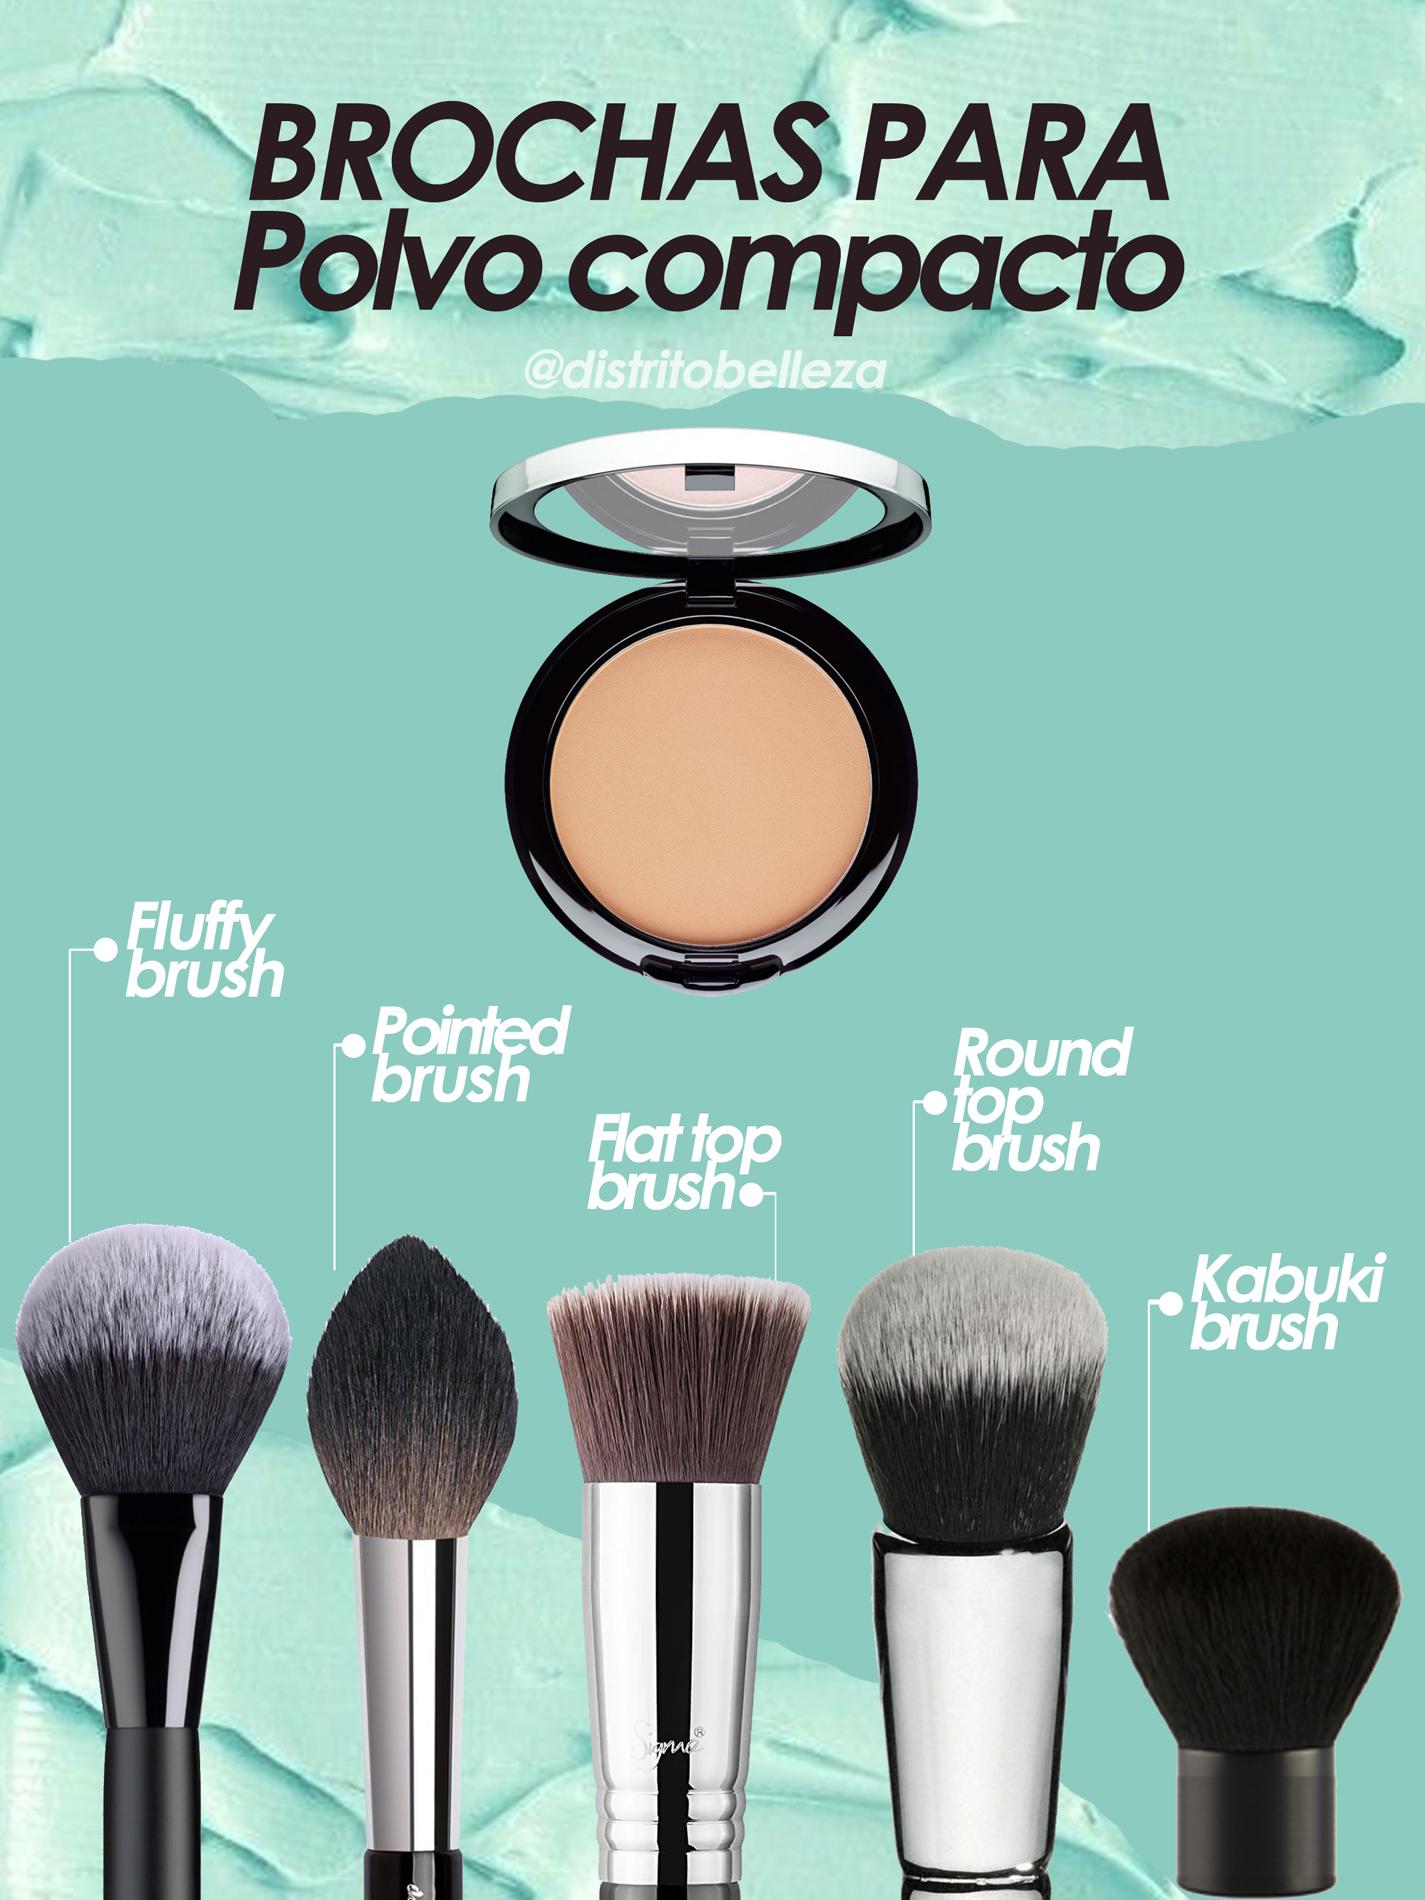 brochas de maquillaje para polvo compacto distrito belleza